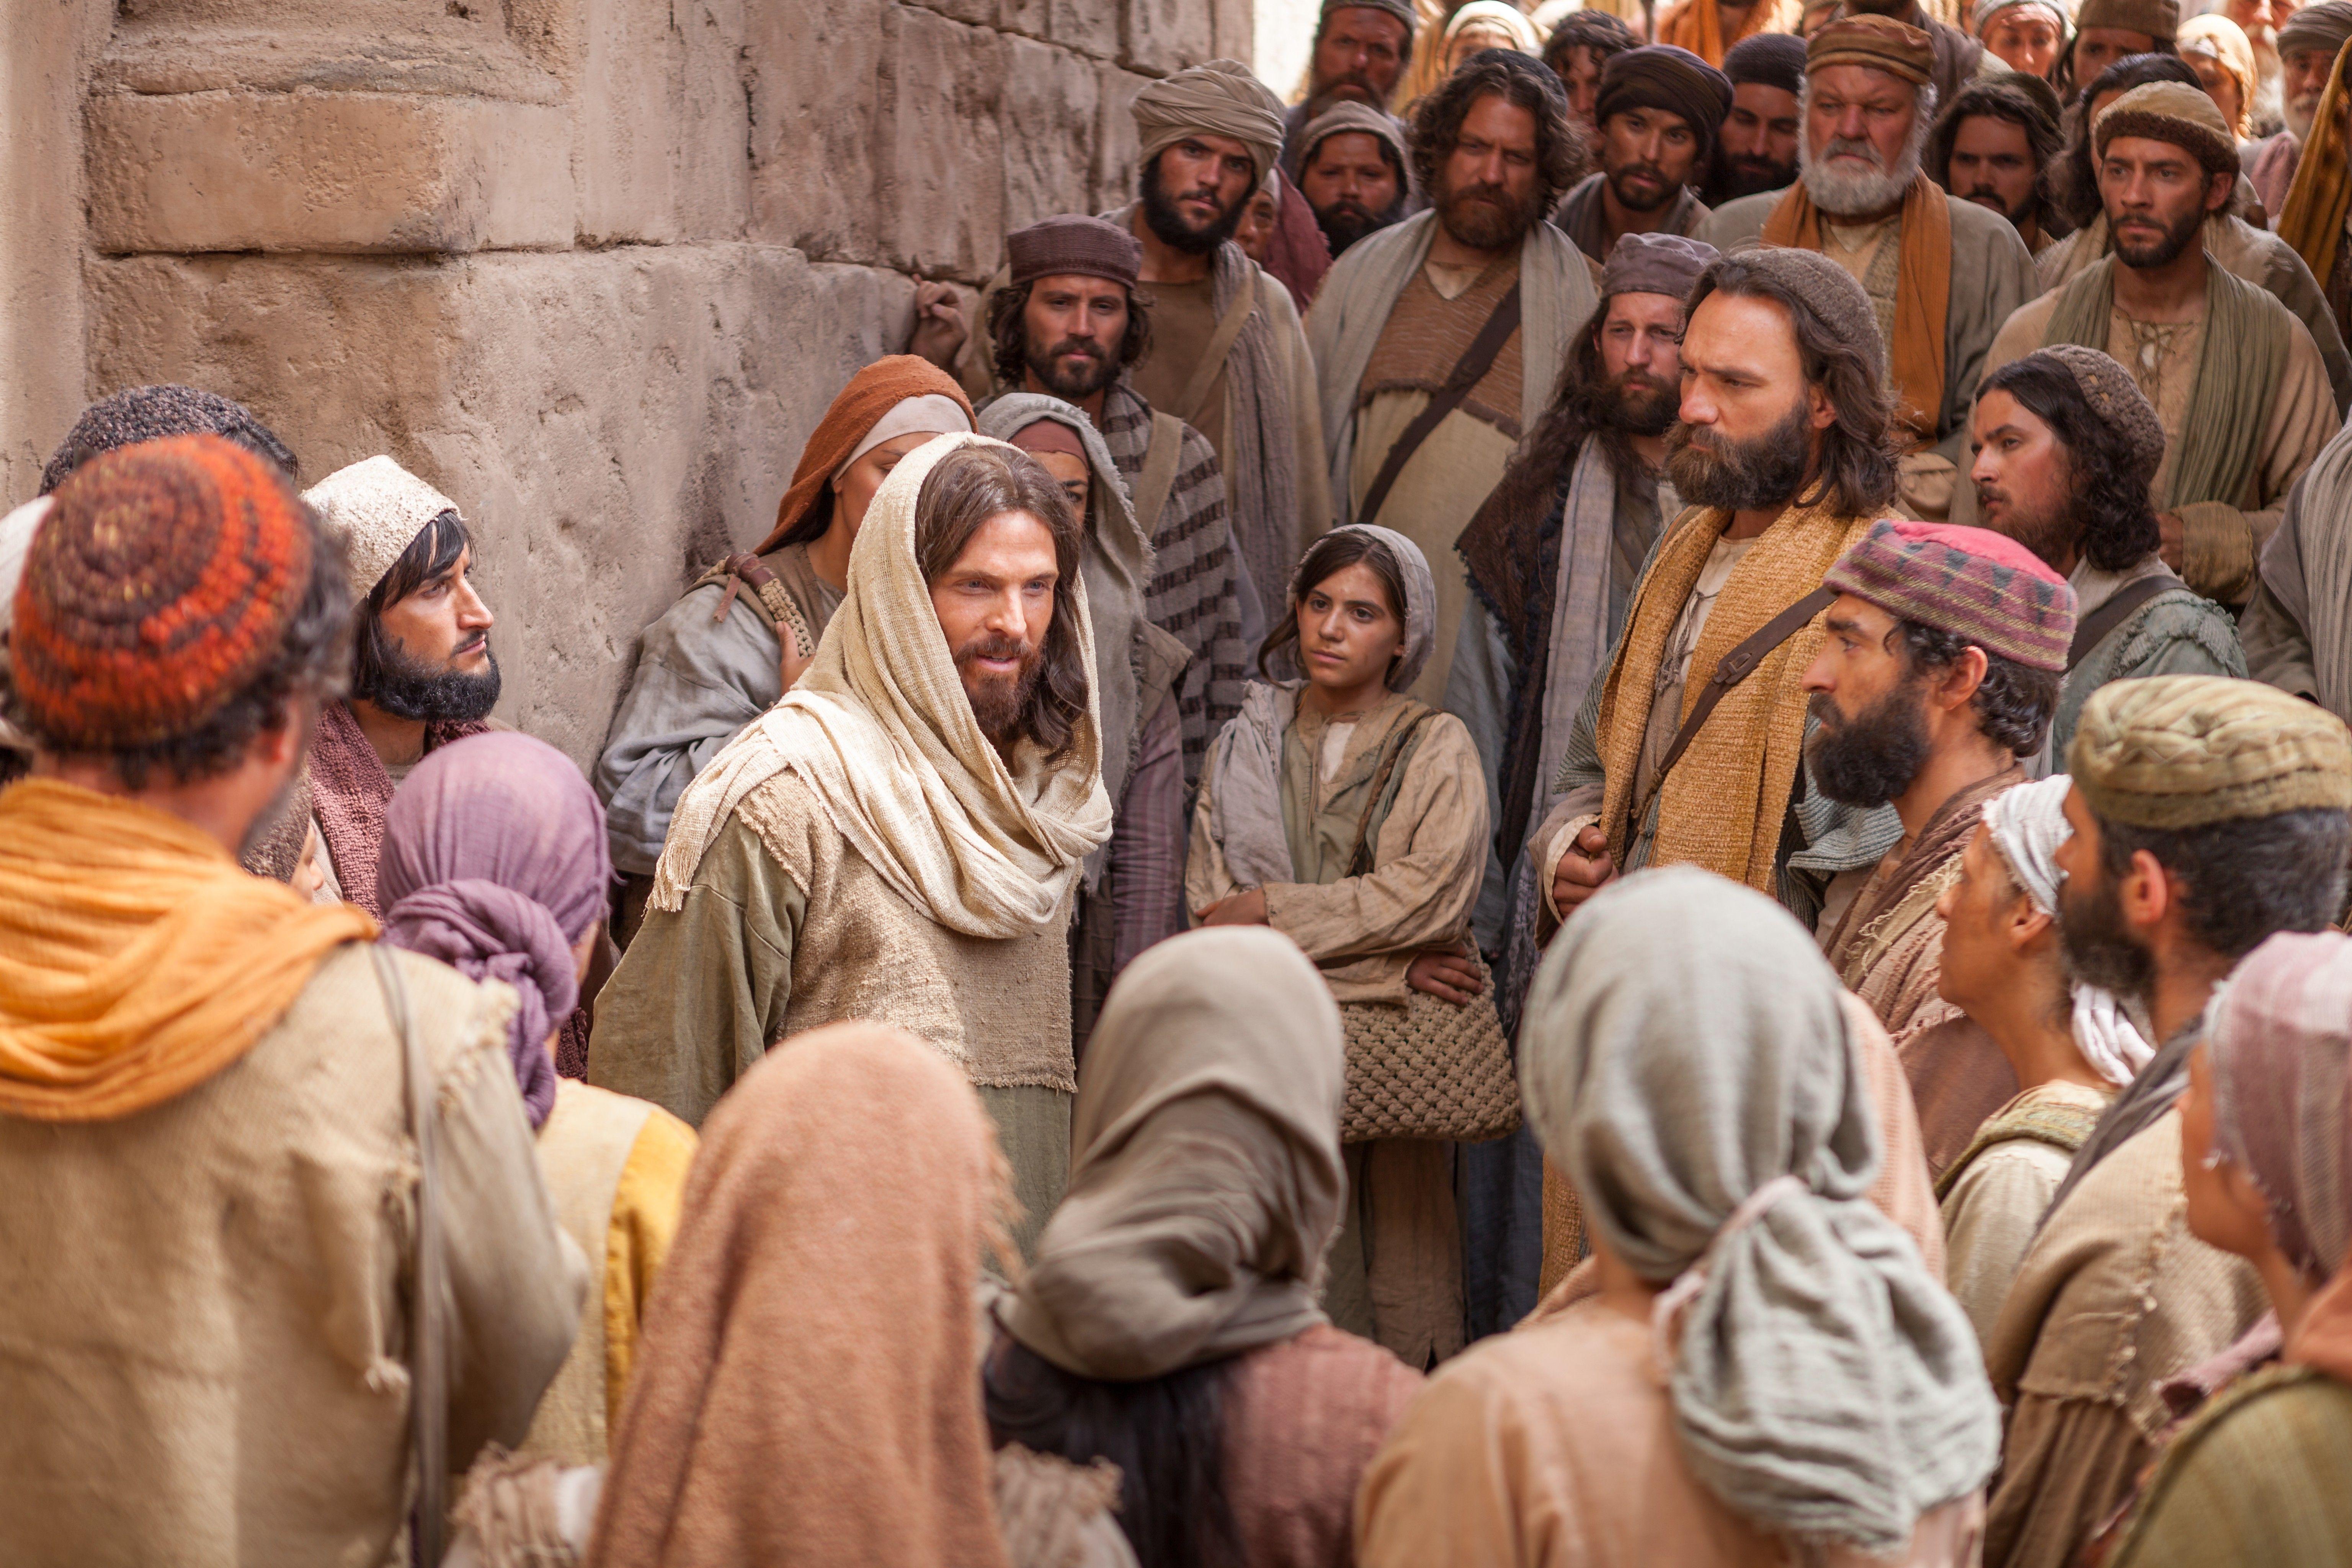 Christ teaches His gospel as disciples follow Him.